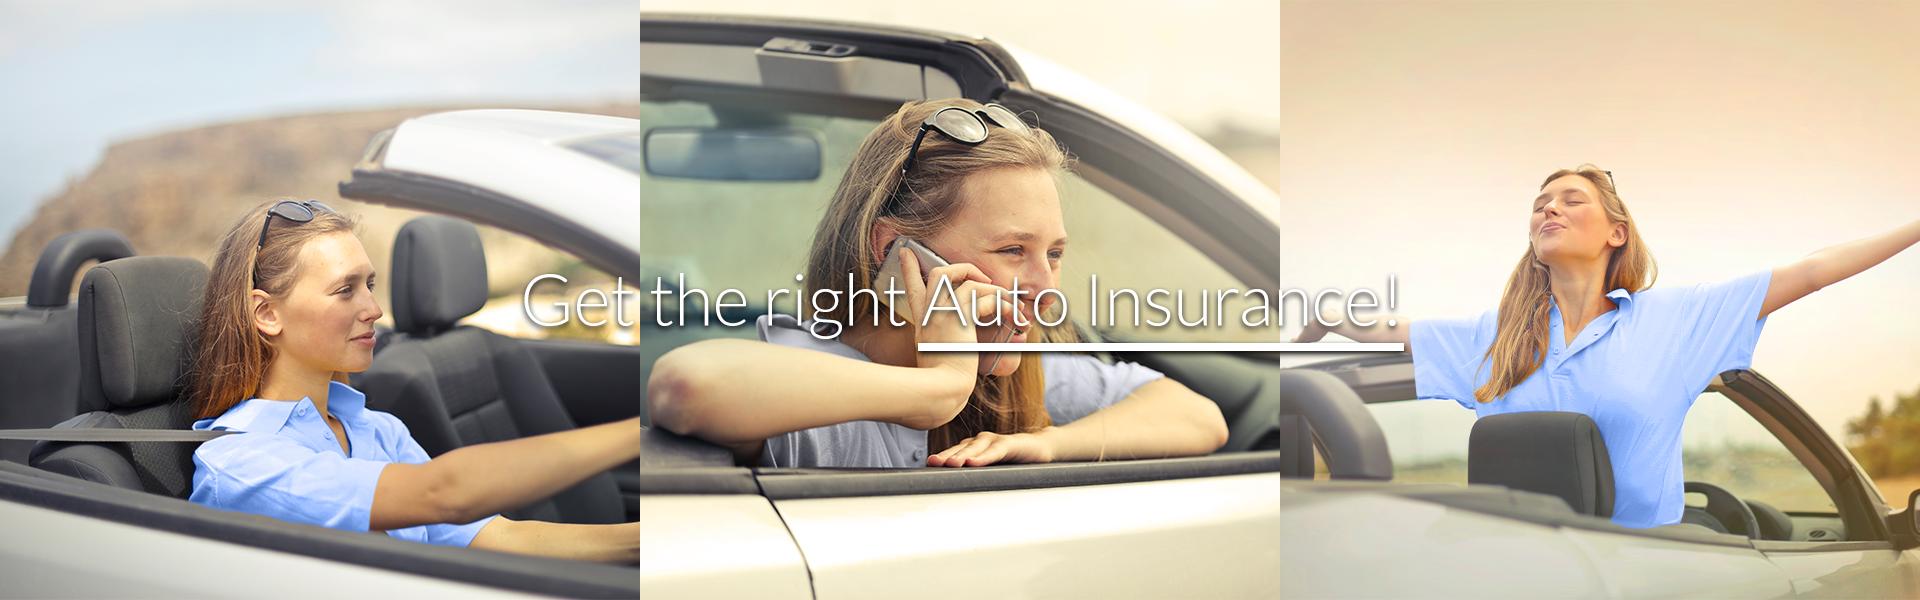 Auto insurance, Zein insurance, Shanley Williams, car insurance, woodland hills